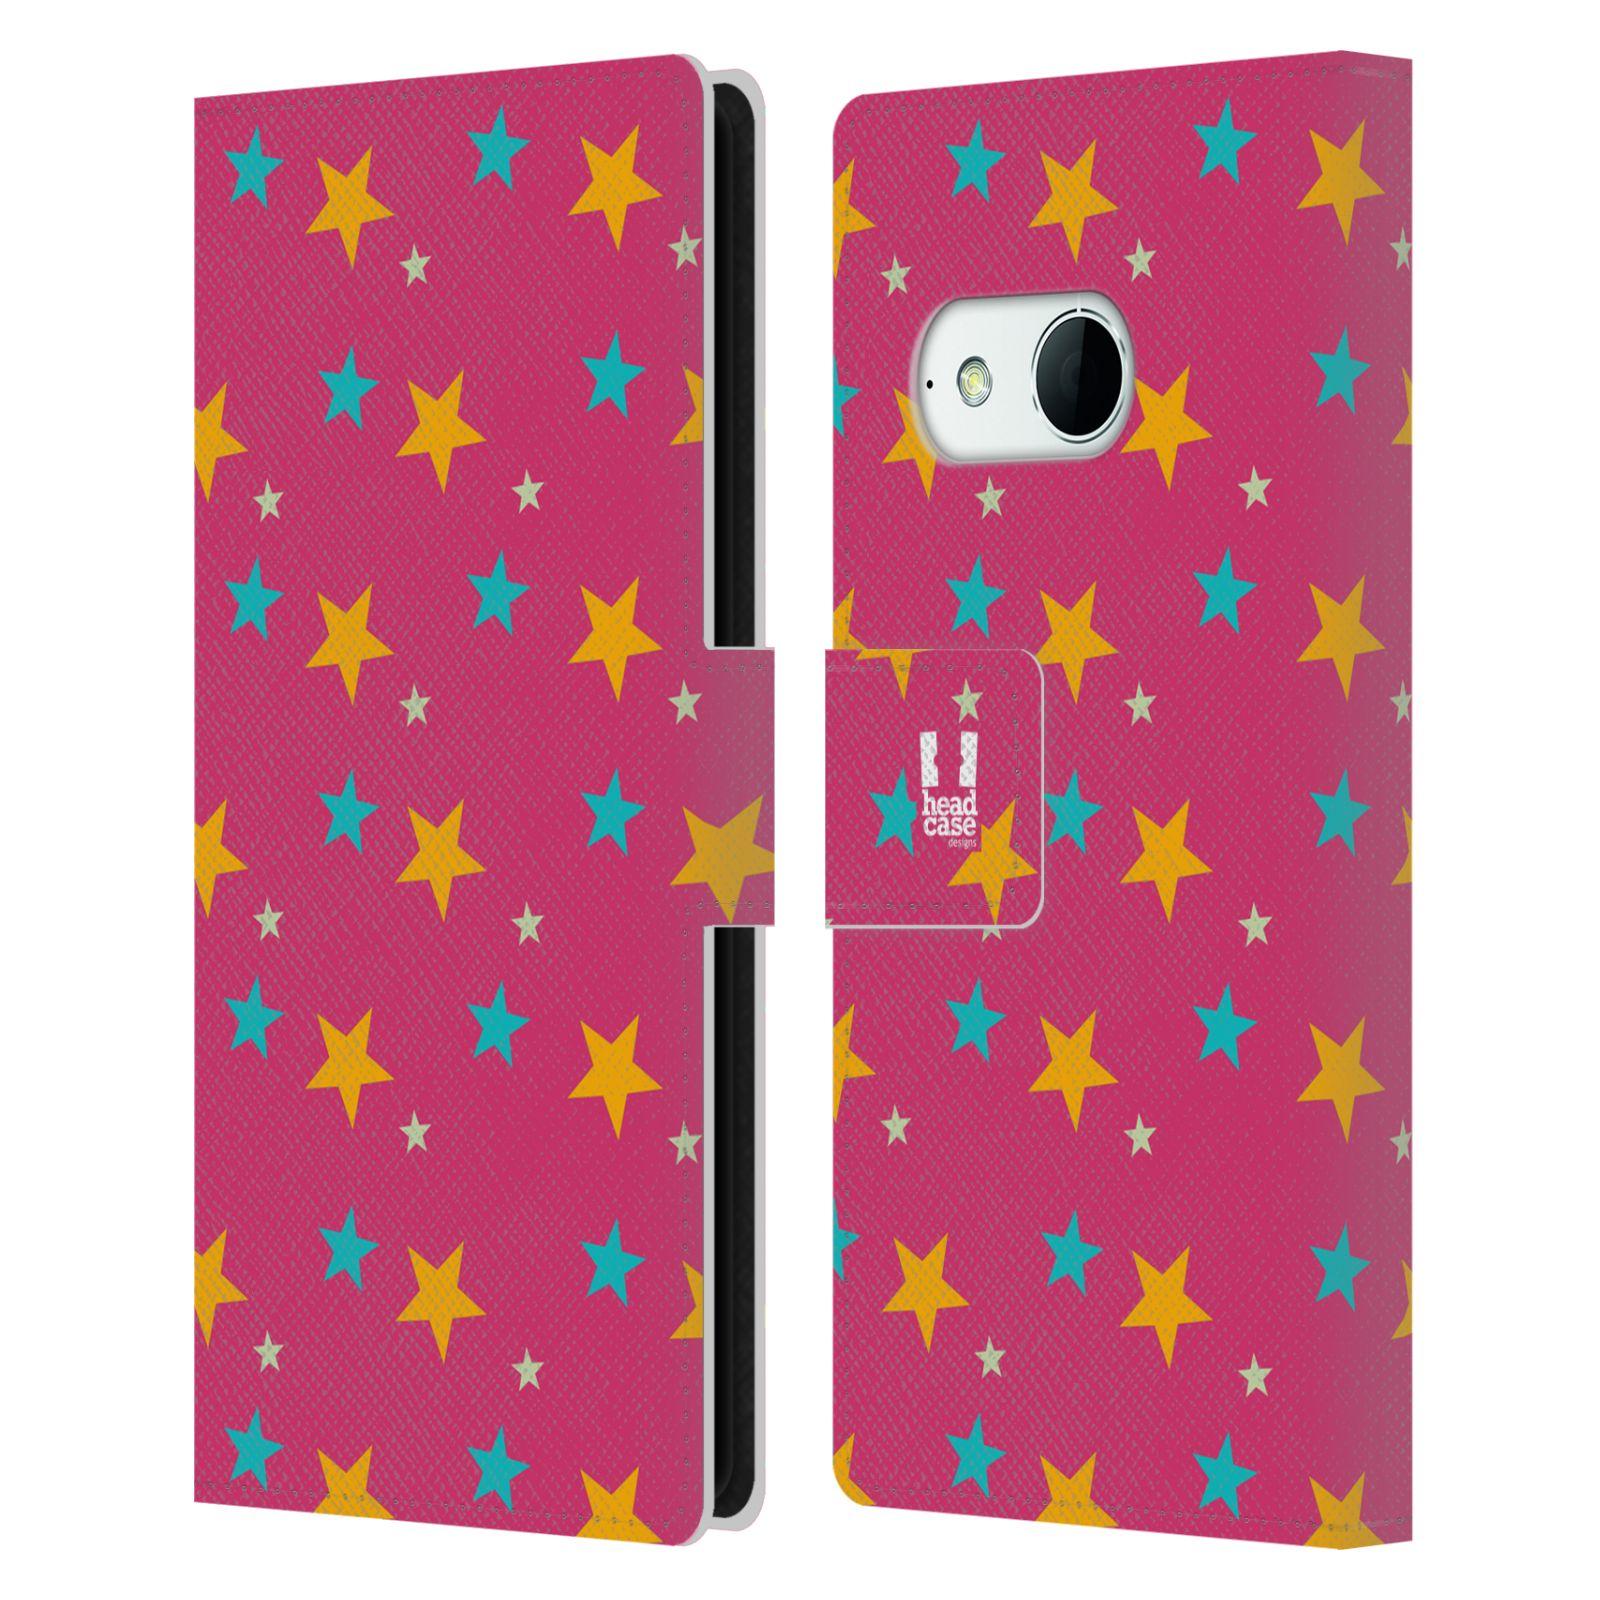 HEAD CASE Flipové pouzdro pro mobil HTC ONE MINI 2 (M8) vzor hvězdičky růžová a žlutá